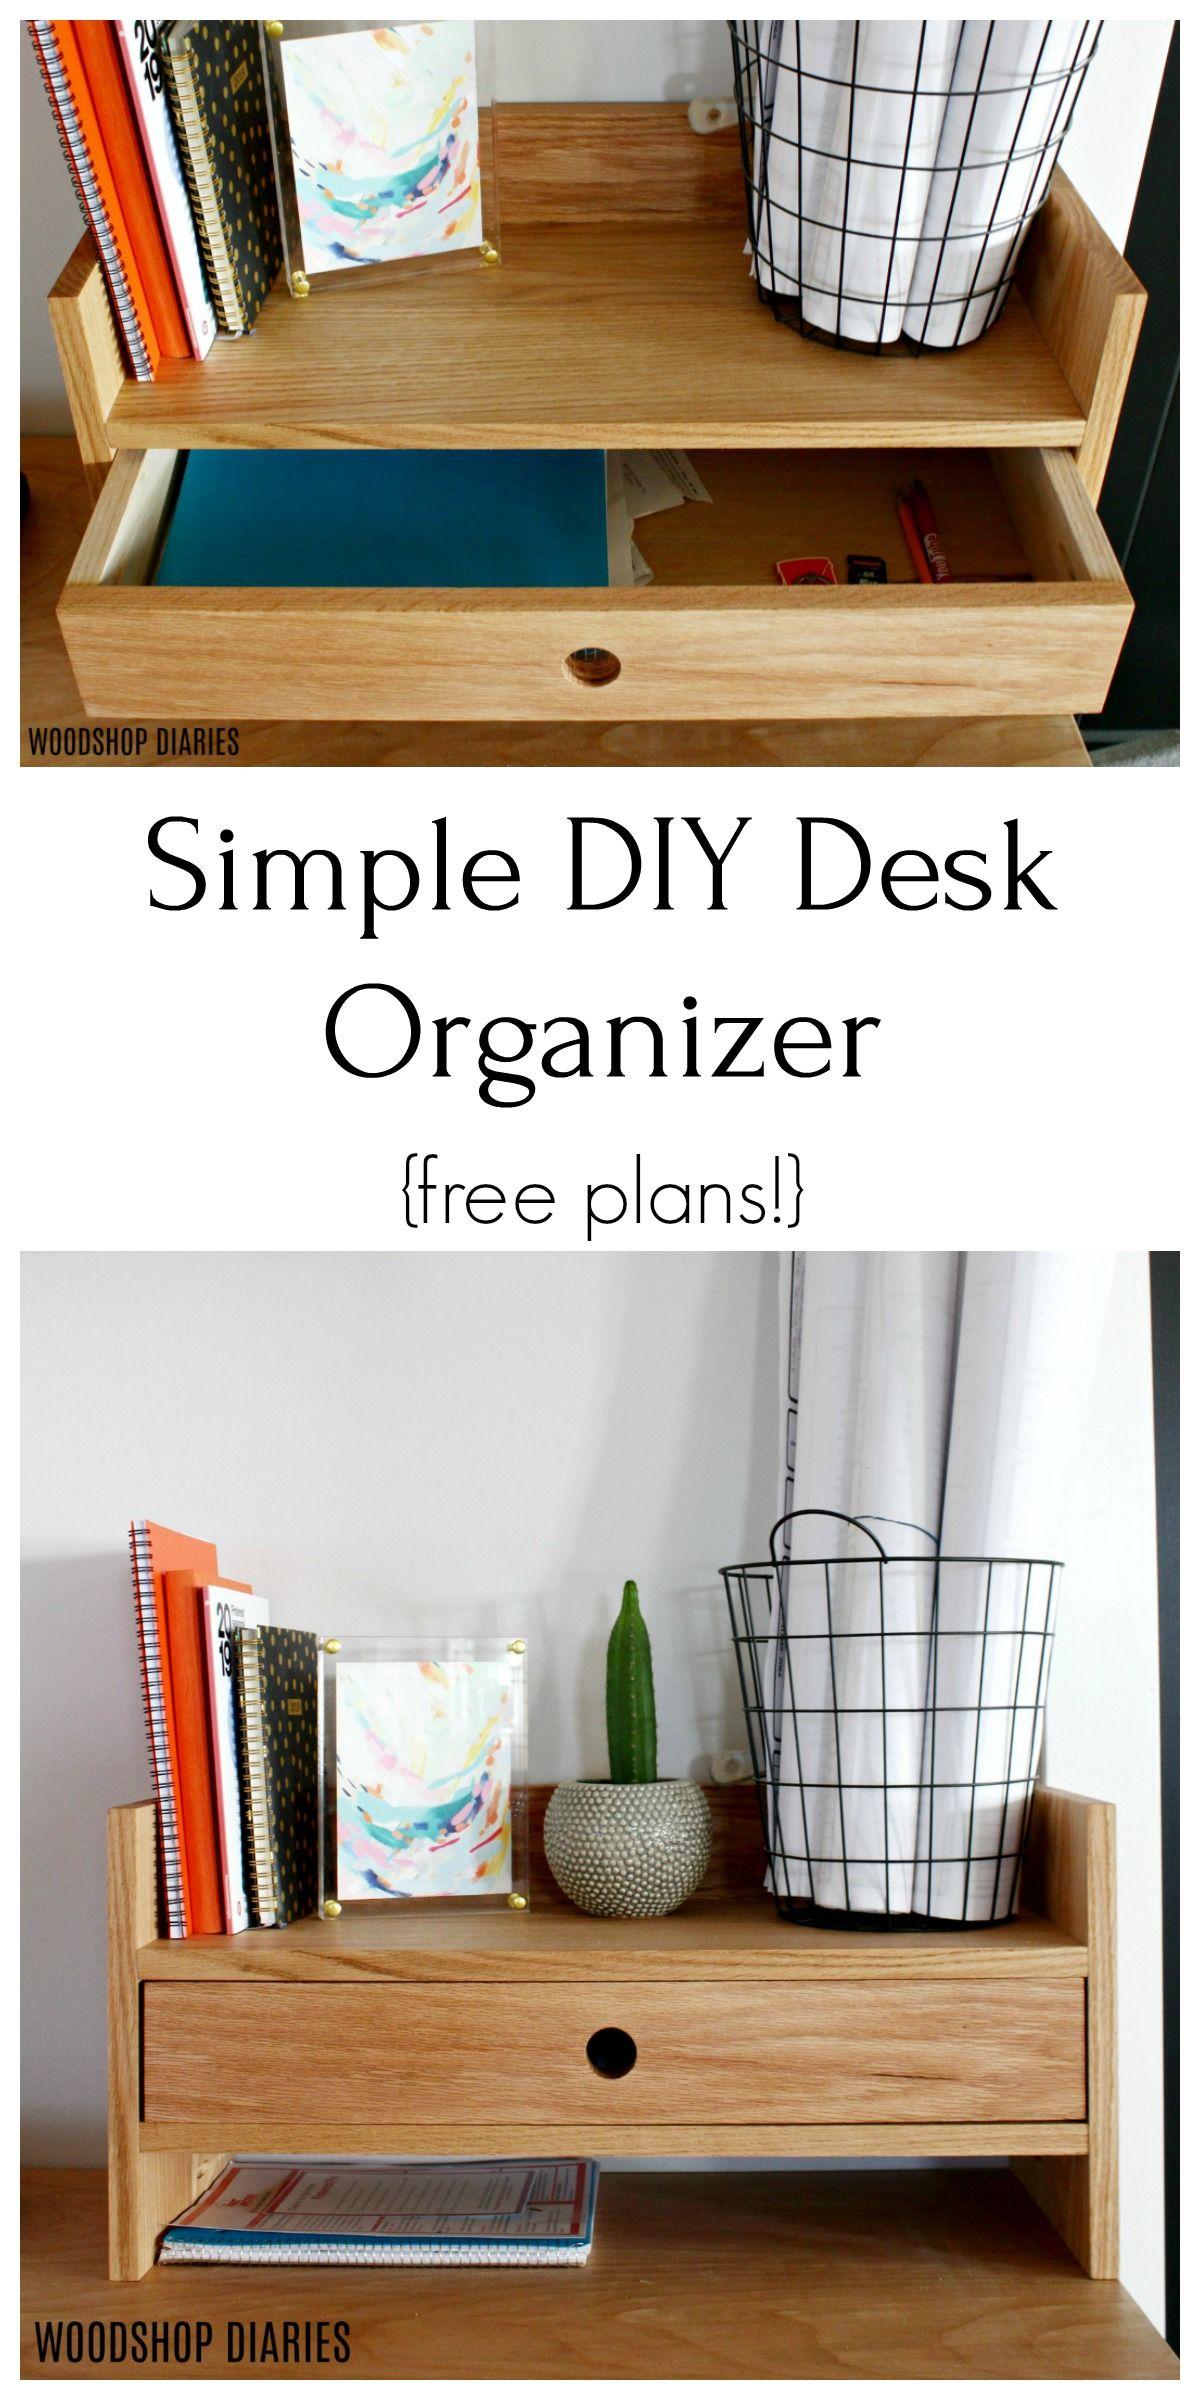 Simple Diy Desk Organizer In 2020 Desk Organization Diy Desk Organization Small Desk Organization